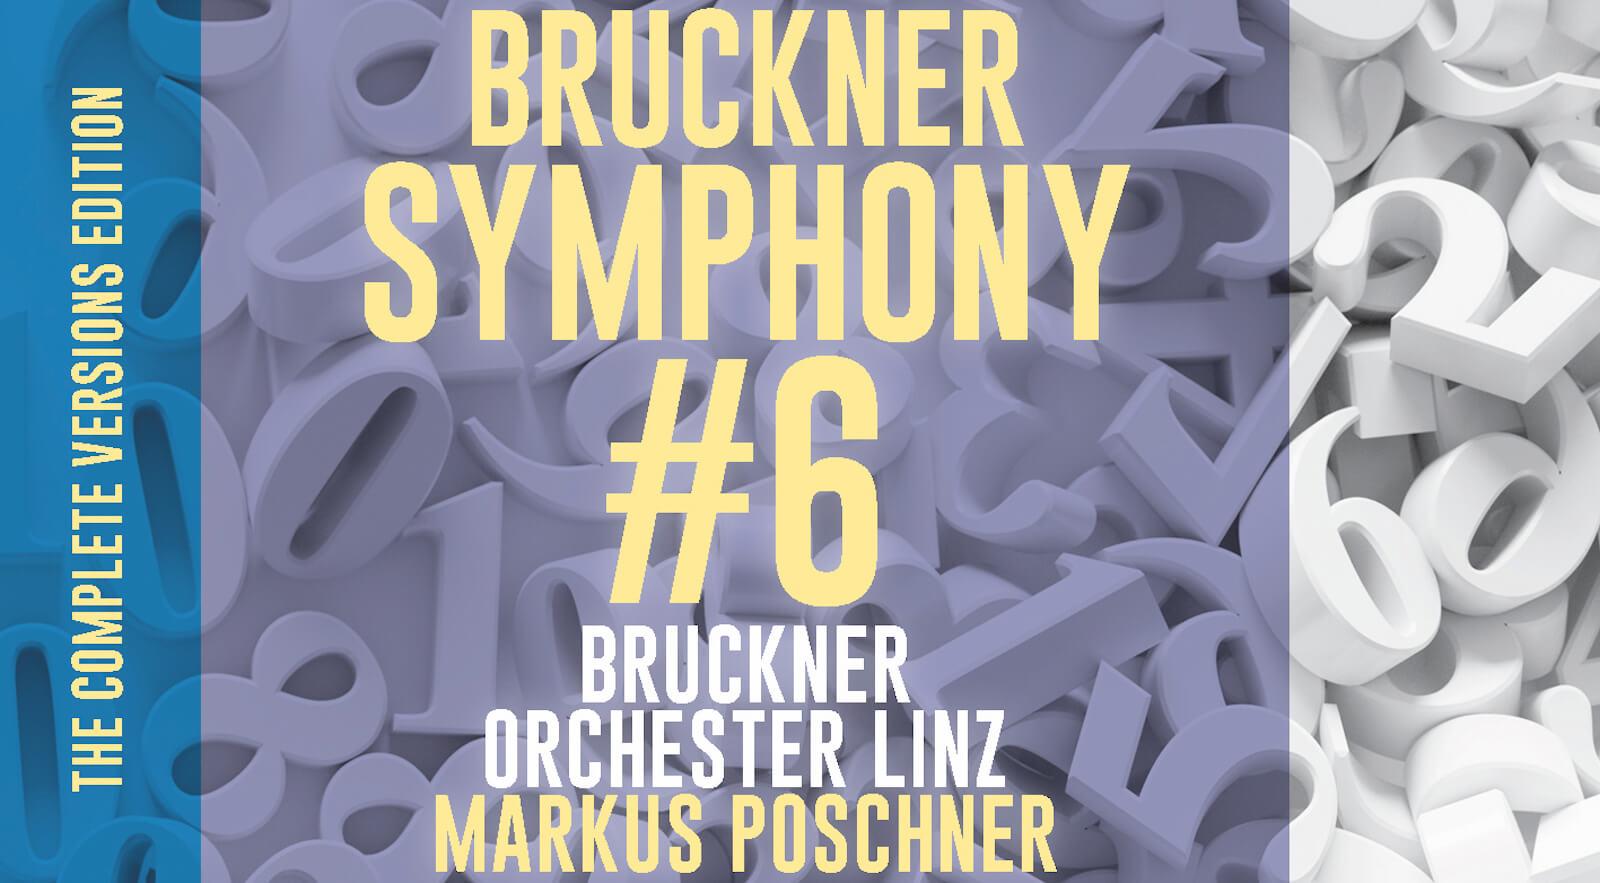 Anton Bruckner Symphony #6